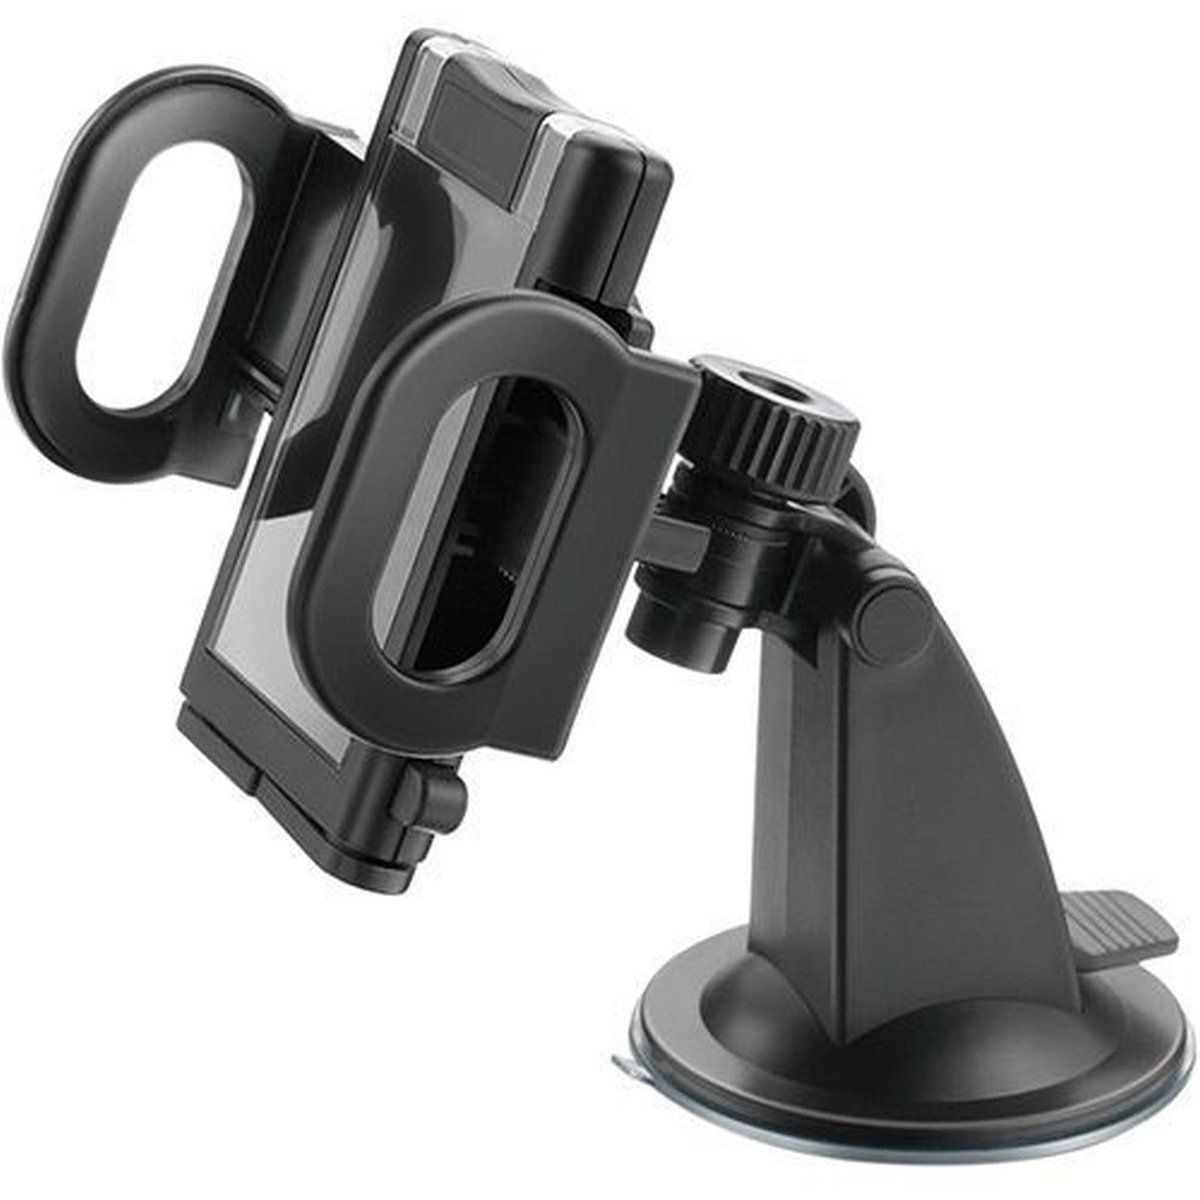 Suporte Universal Veicular Para Smartphone Compacto CP118S